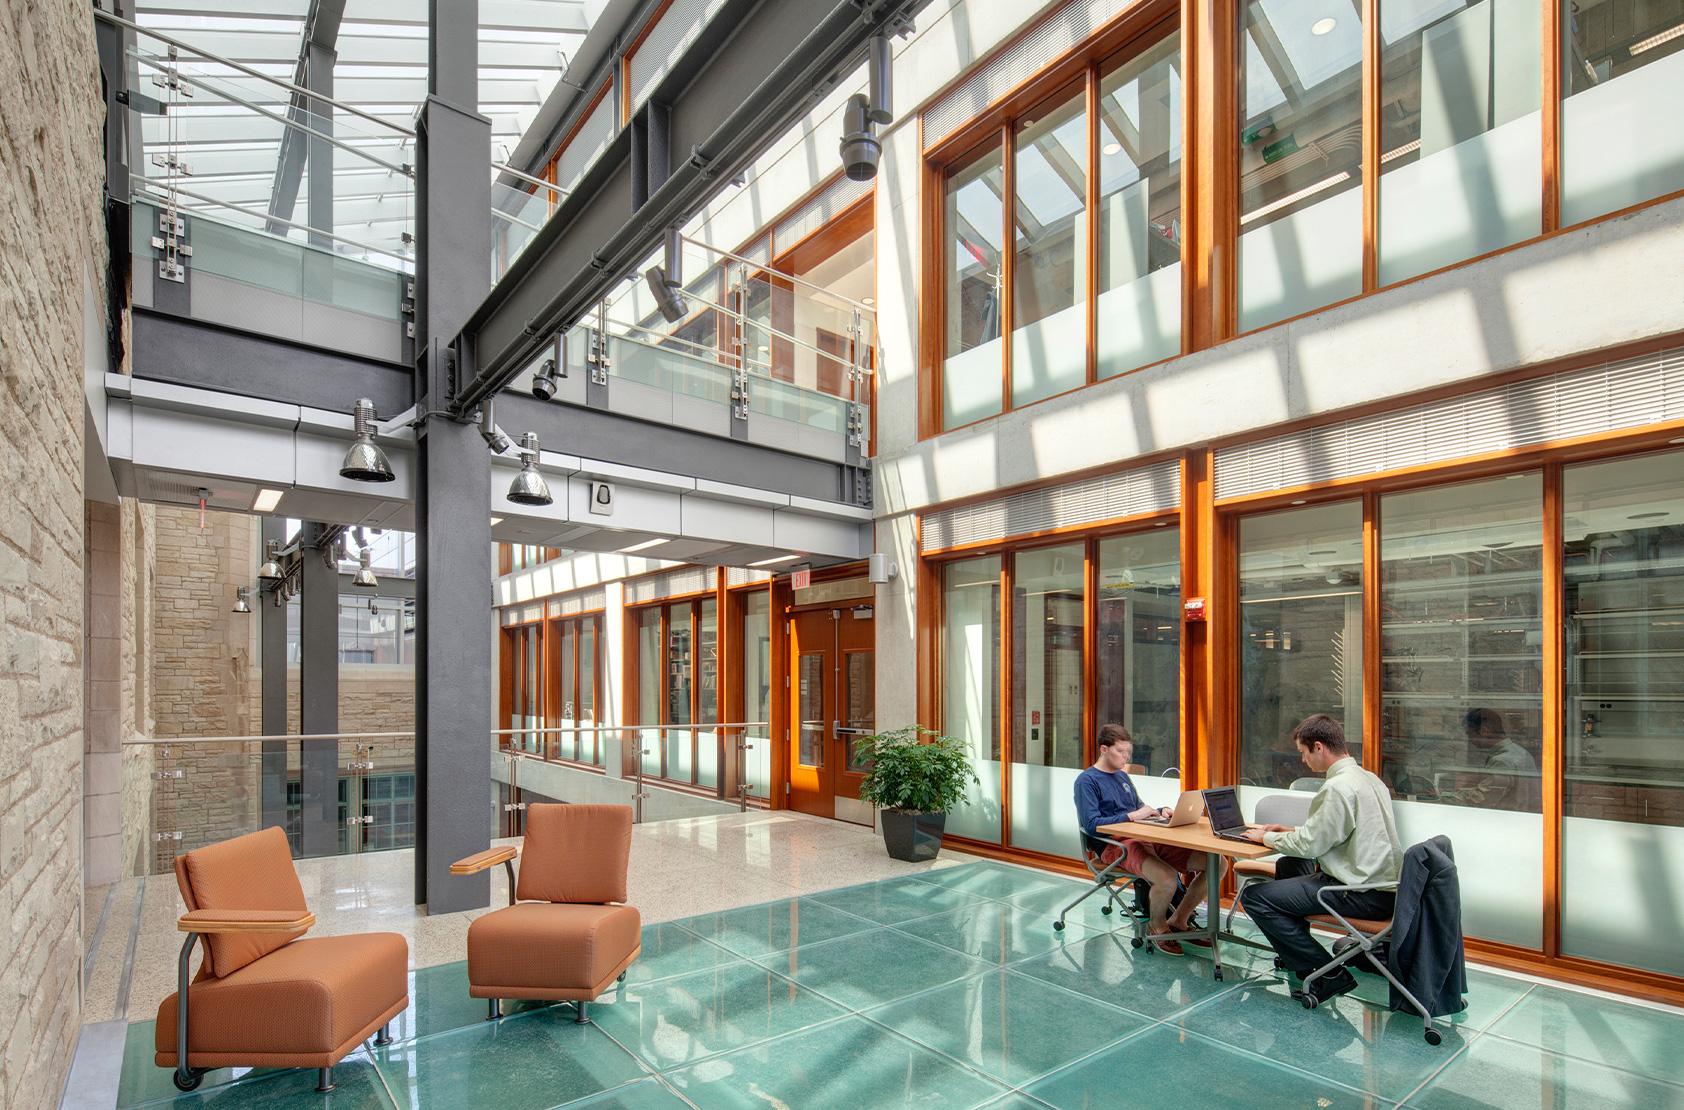 Northwestern University - Technological Institute